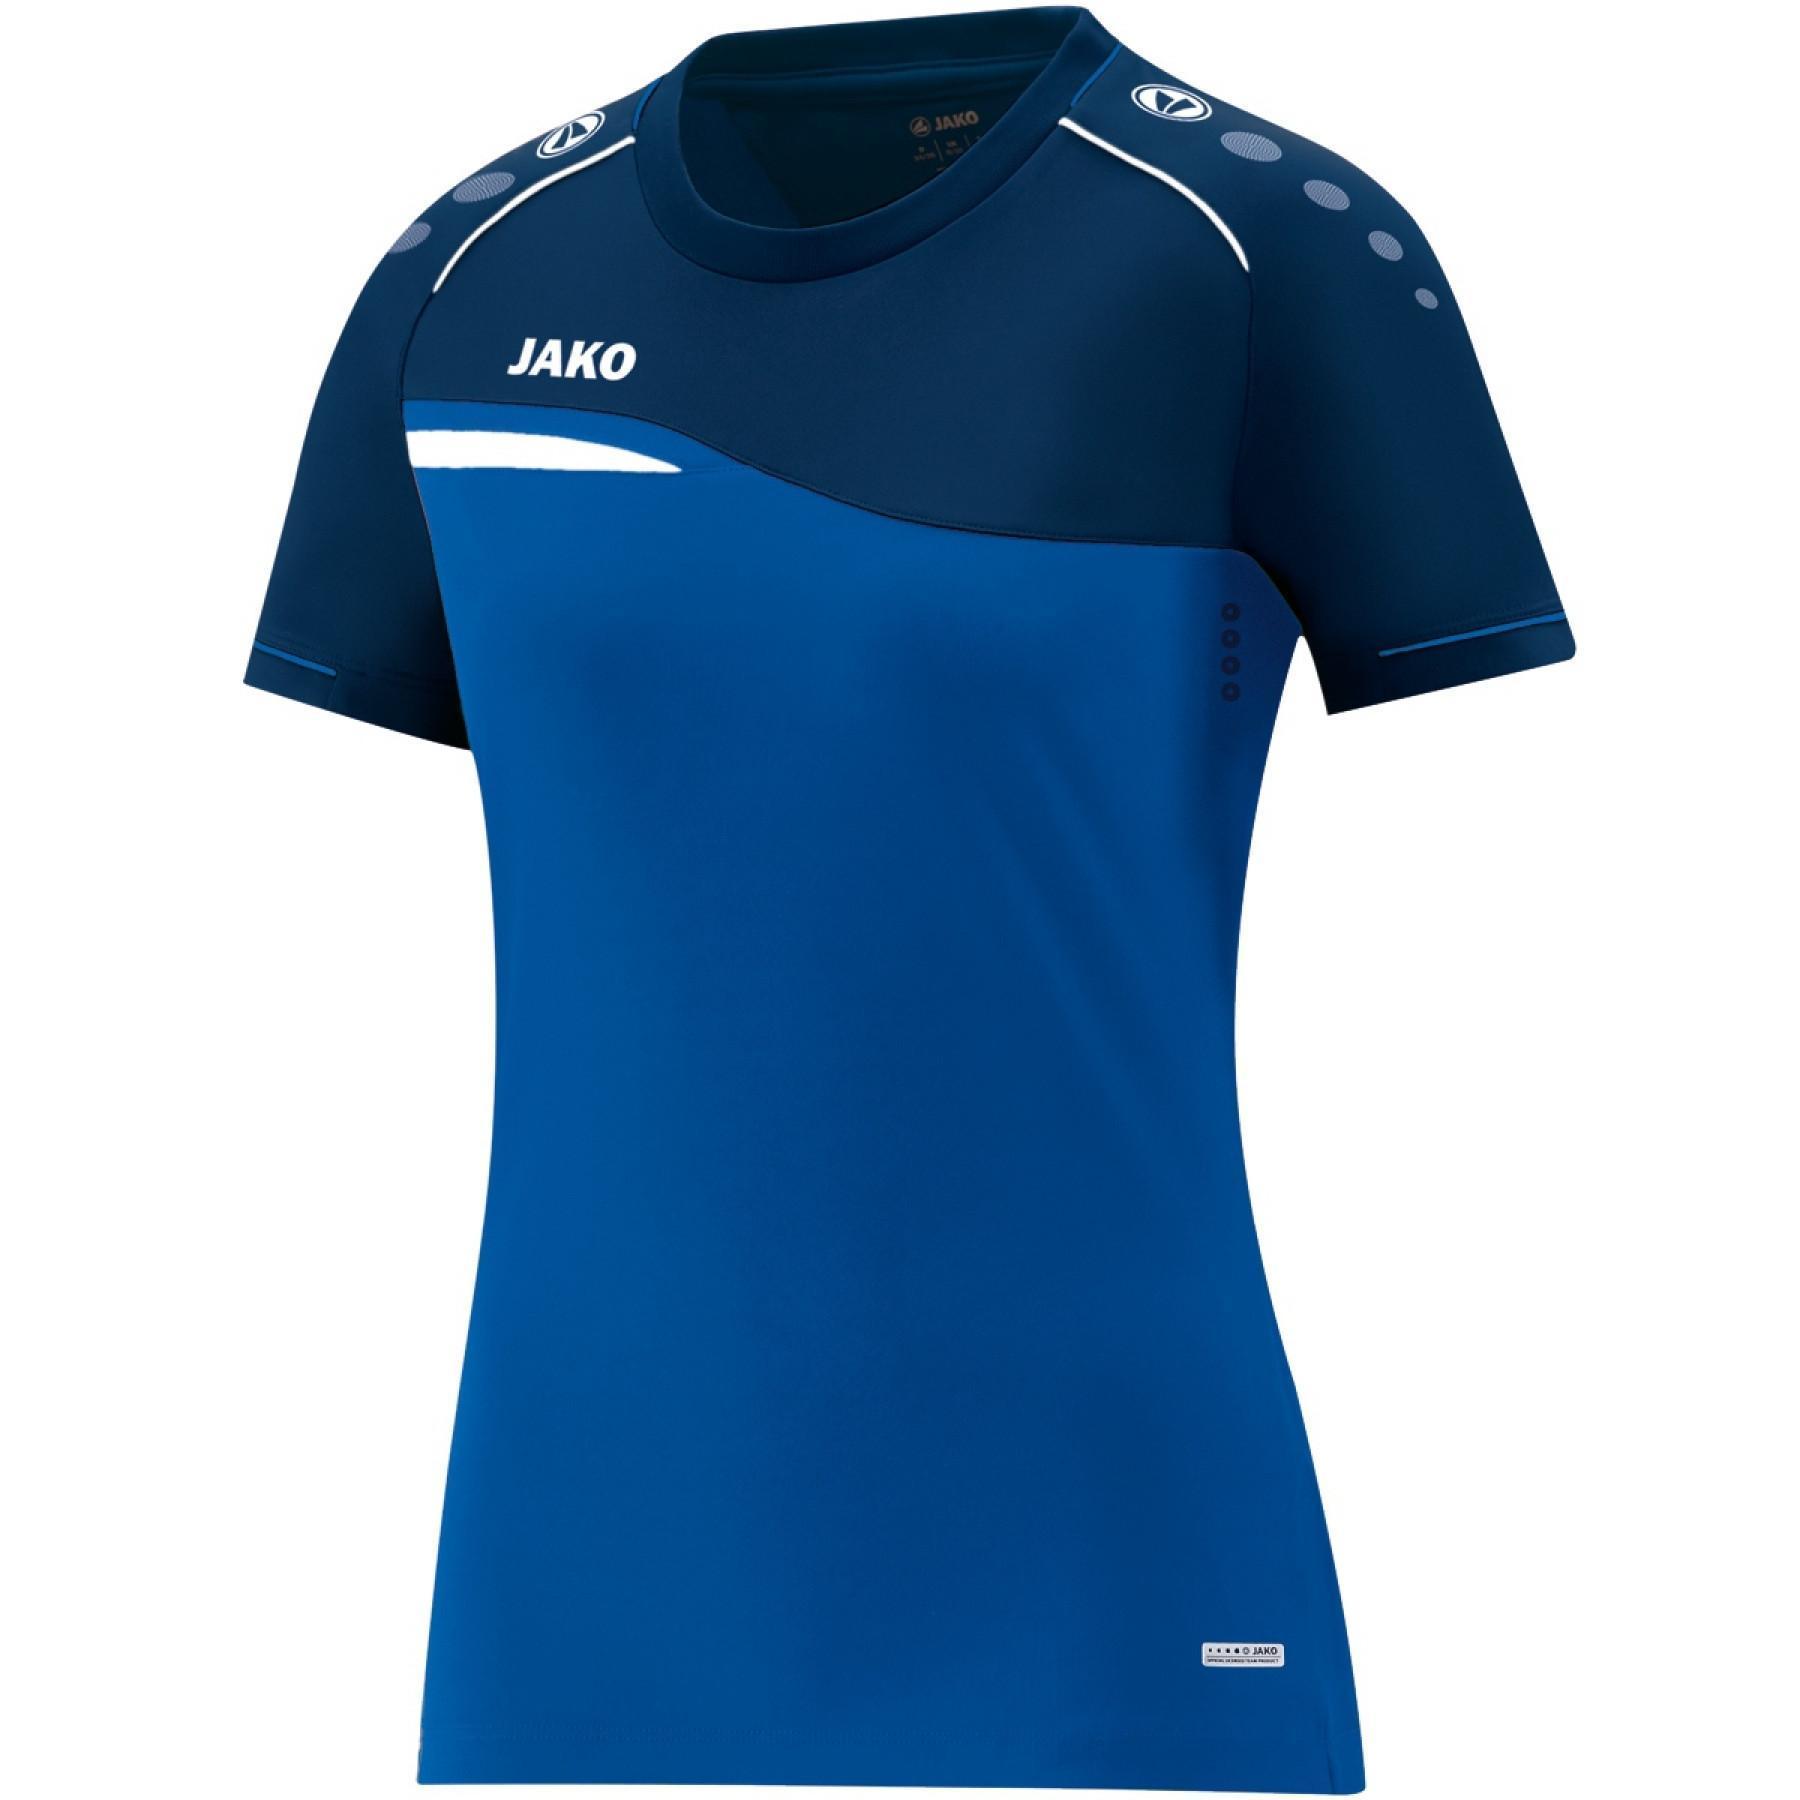 T-shirt woman Jako Competition 2.0